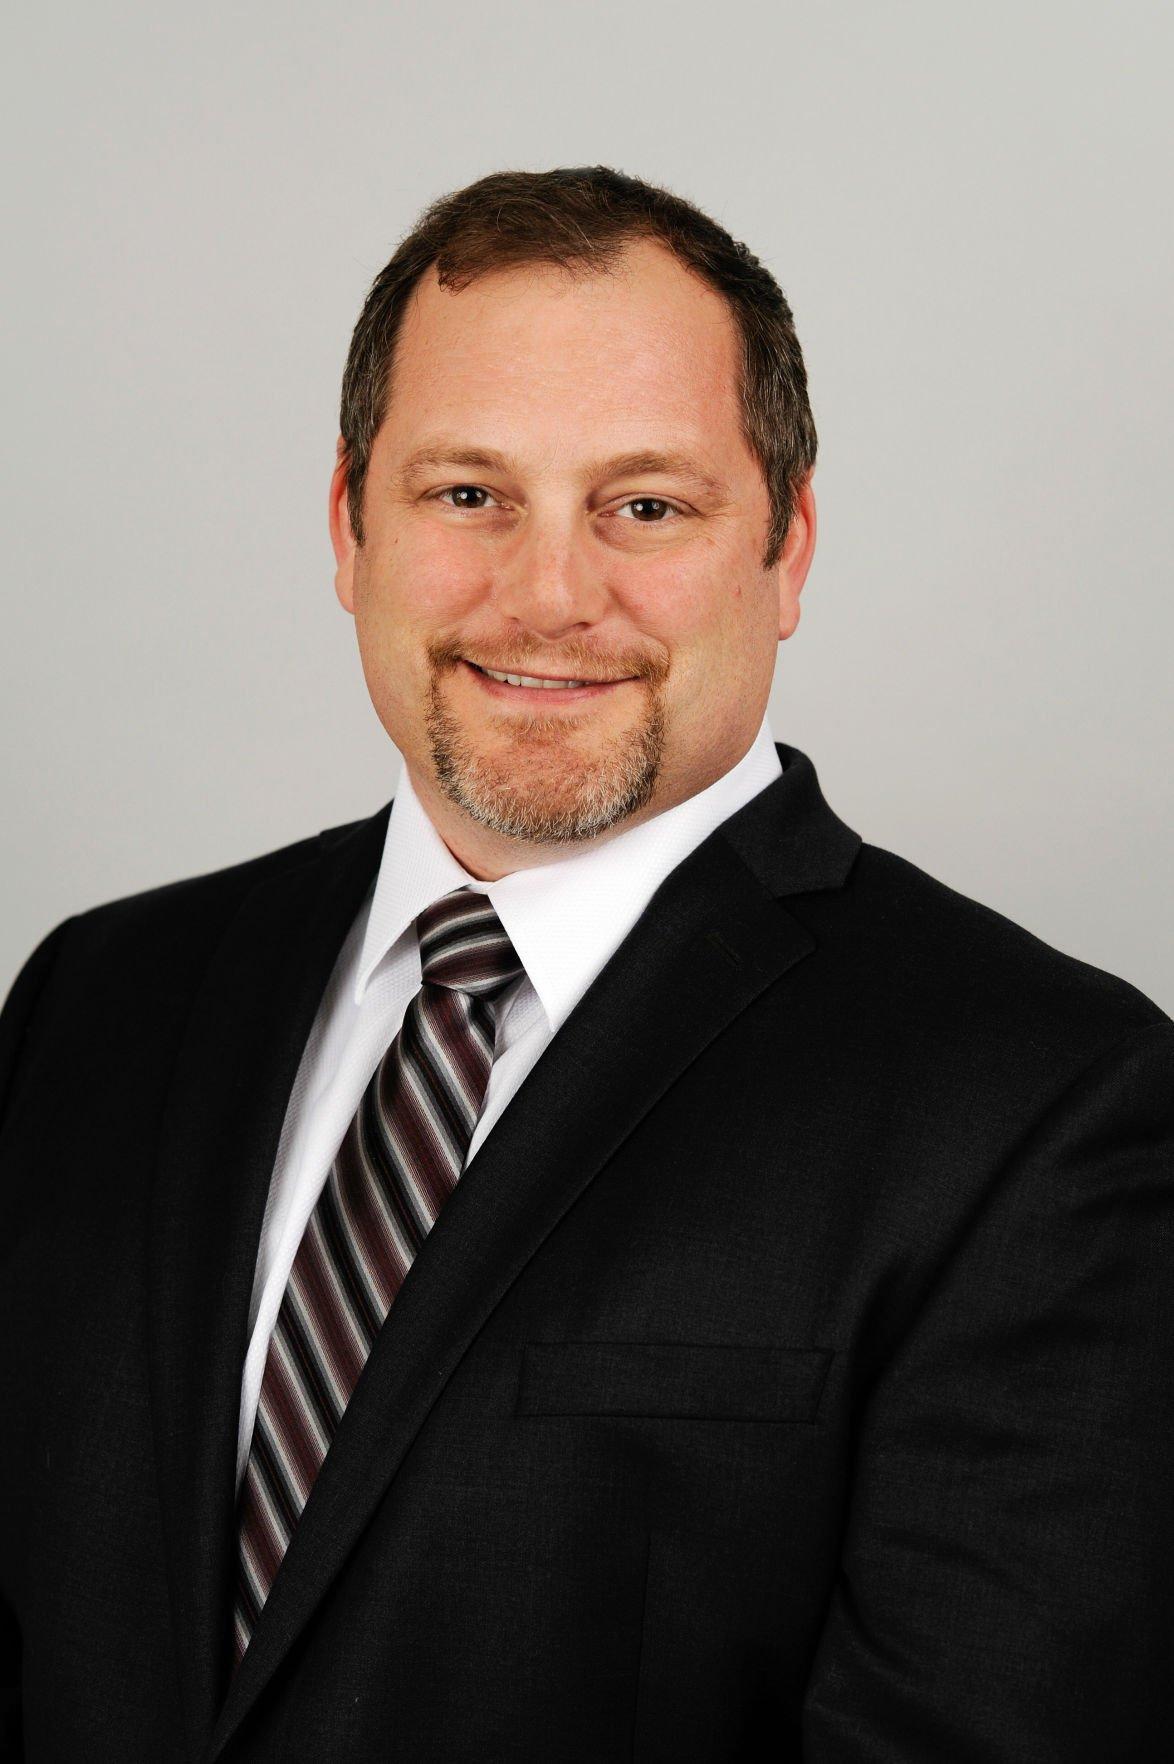 Kevin M. Danley